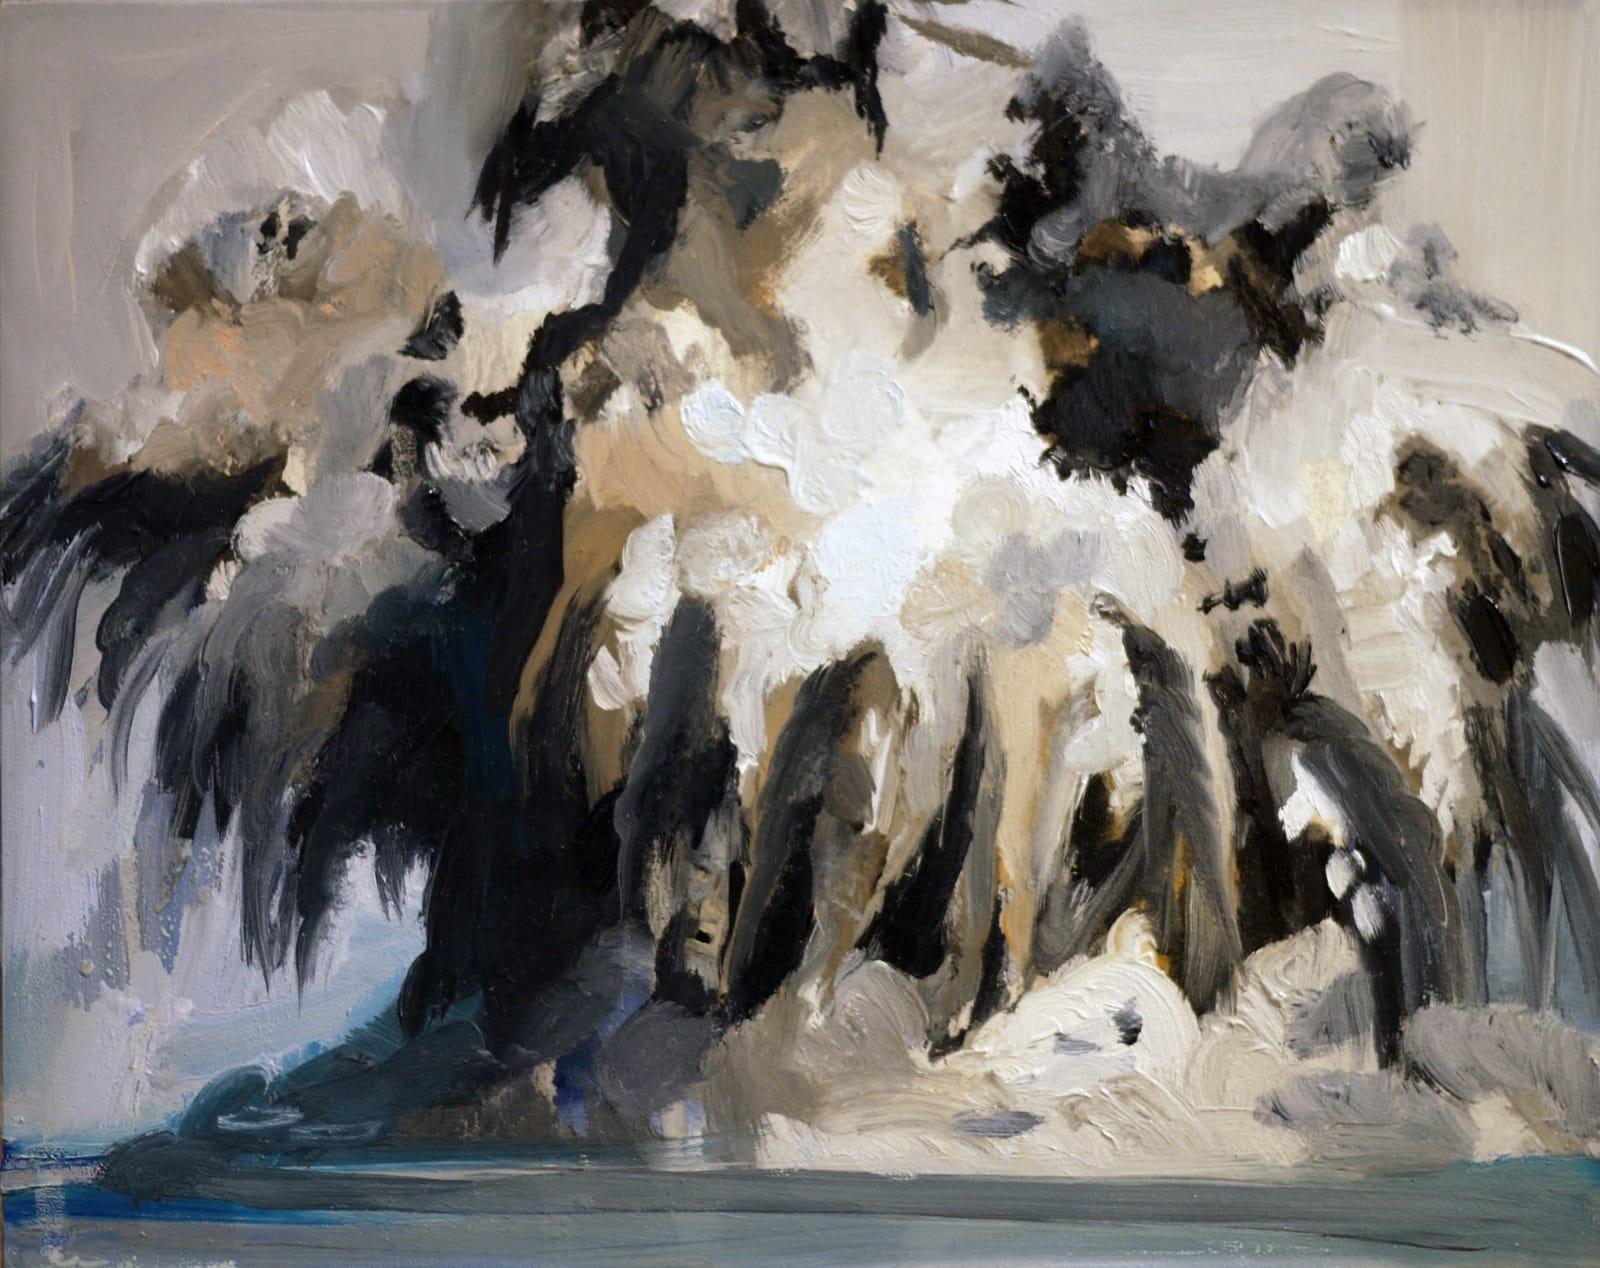 Elizabeth Schwaiger, Smoke and Water Explosion , 2014